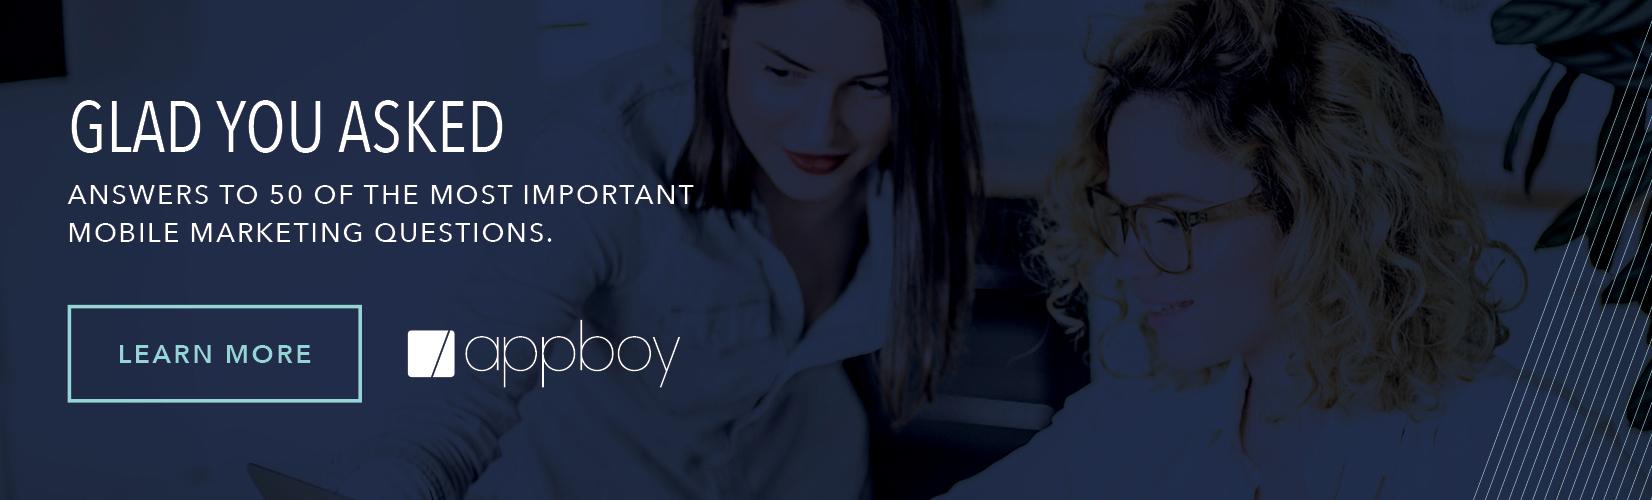 Appboy Mobile Marketing FAQs Ebook